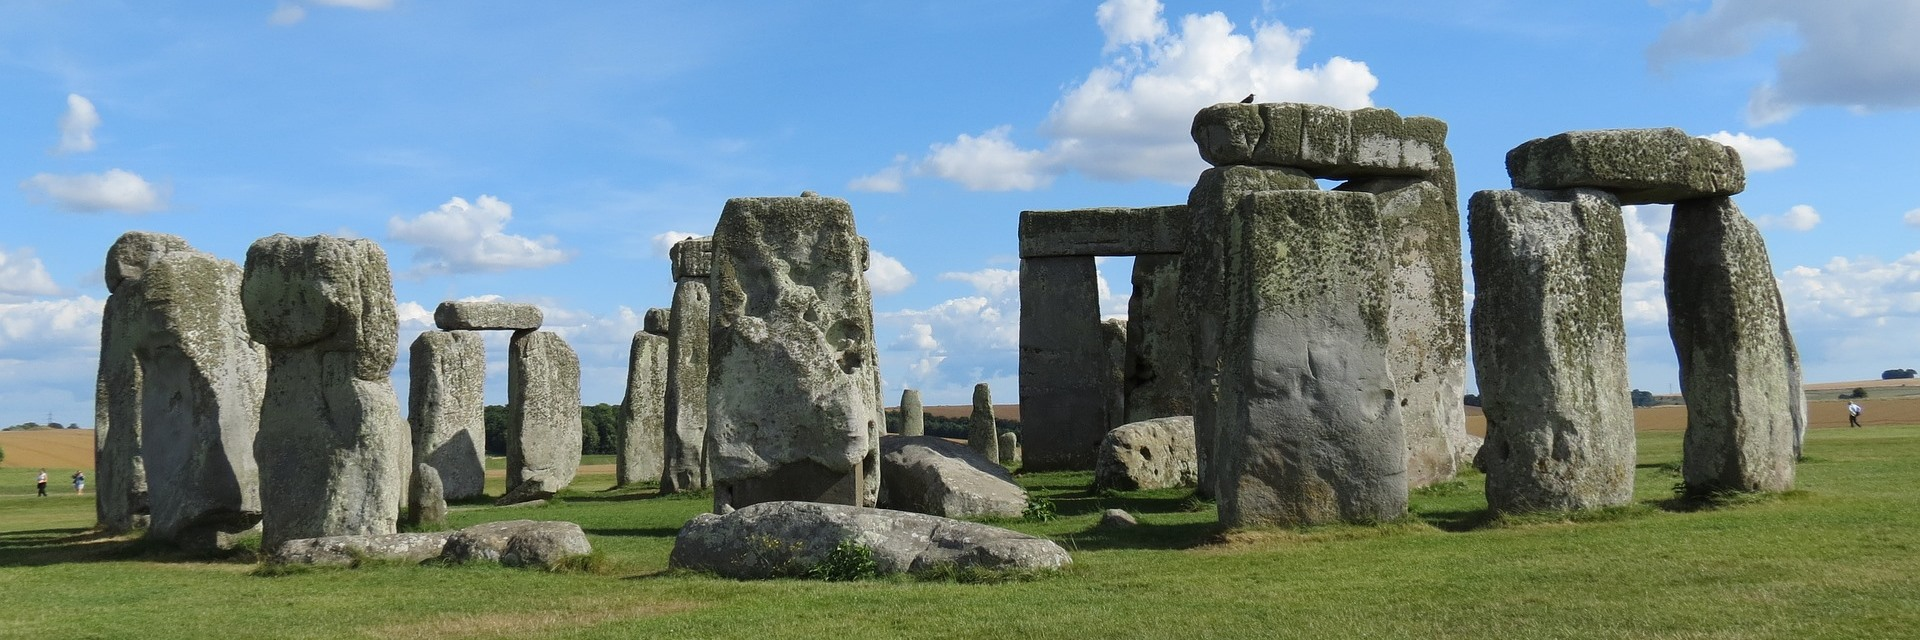 stonehenge-header